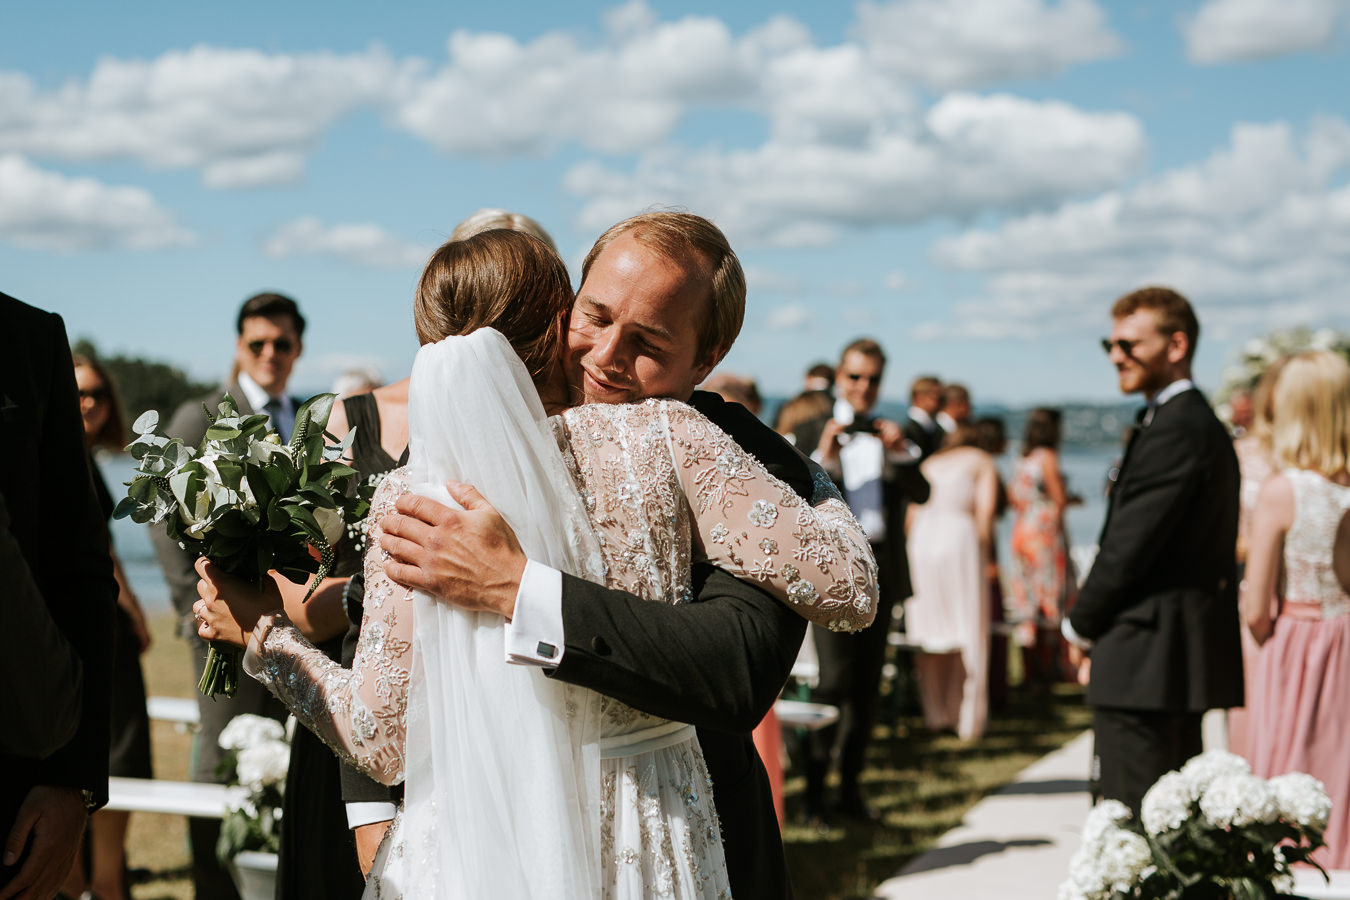 Bryllup-Hellviktangen-fotograf-tvedt-131.jpg